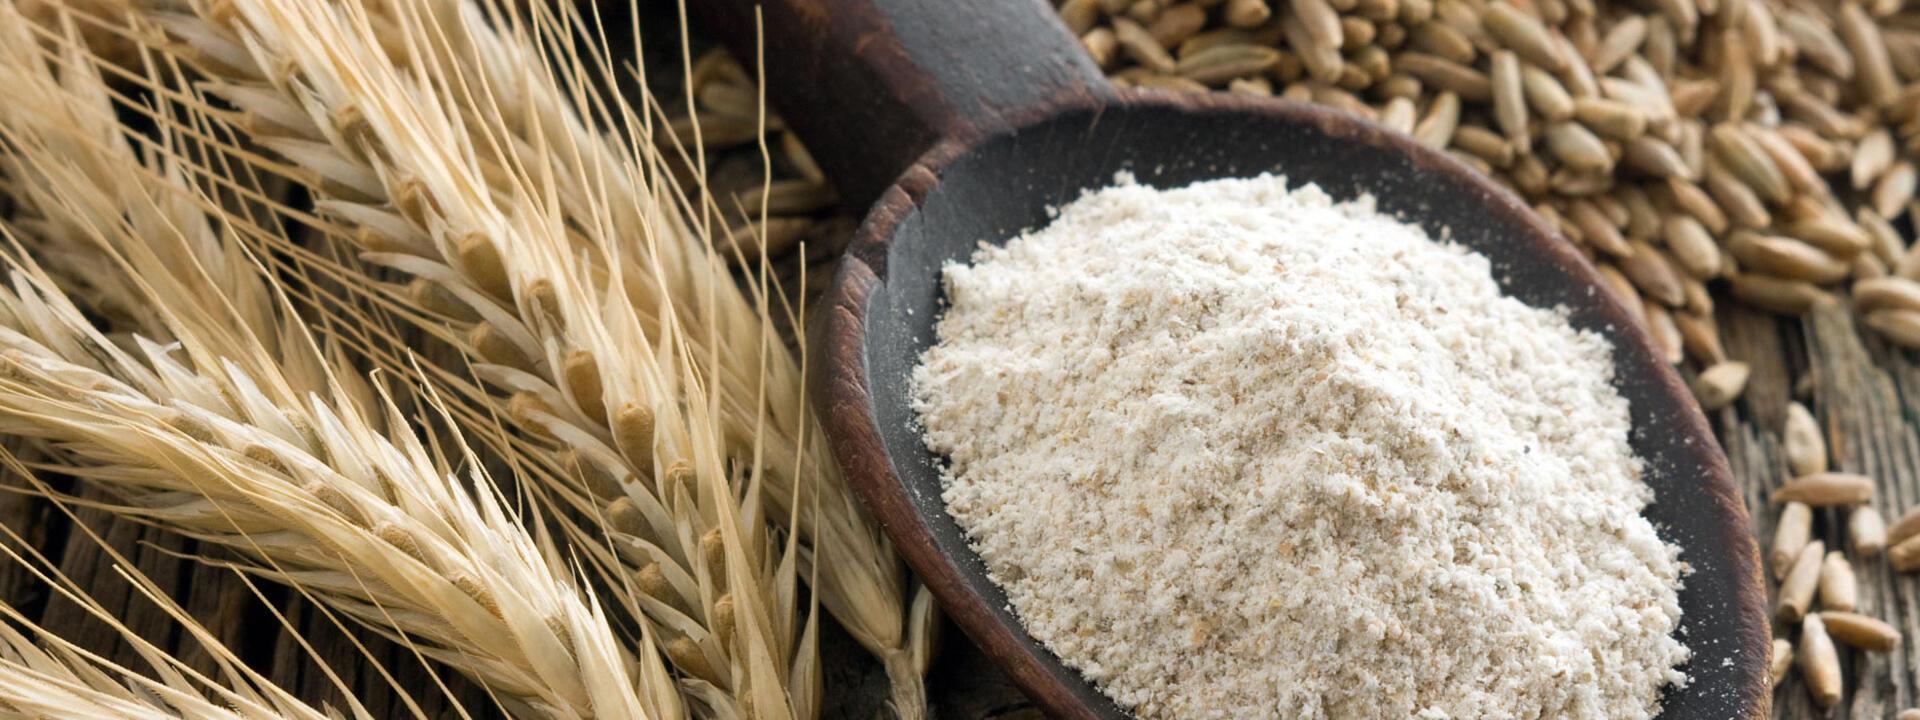 riccionepiadina it farine-piadina-romagnola 001